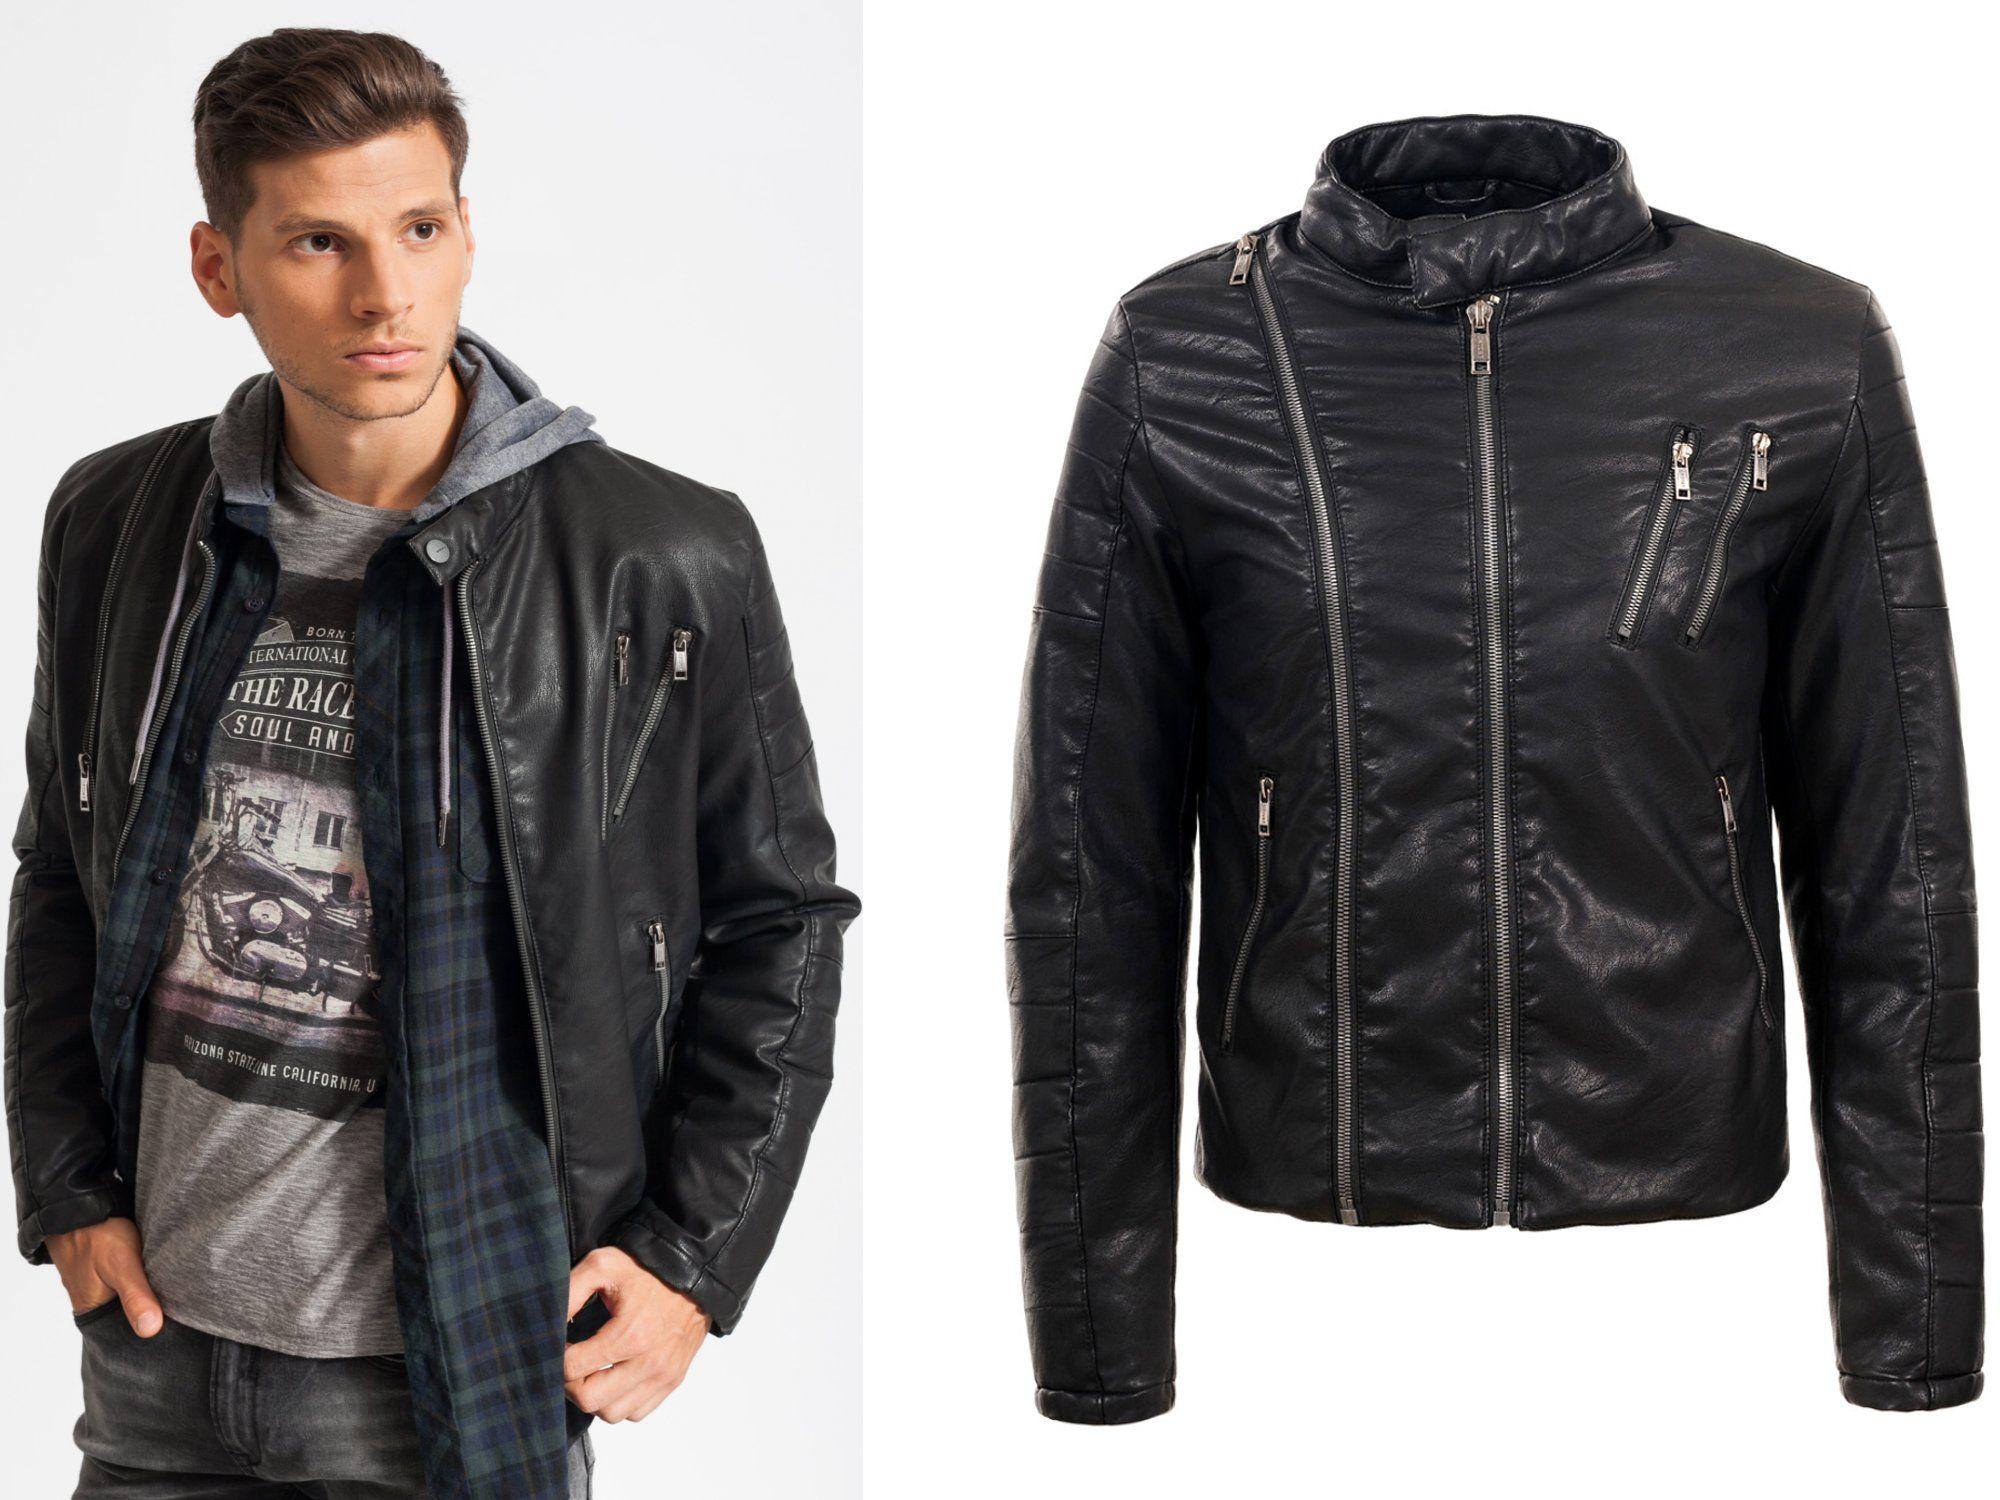 Kurtka Meska Skorzana Eko Skora Ocieplana Okazja M 6975998889 Oficjalne Archiwum Allegro Jackets Leather Jacket Leather